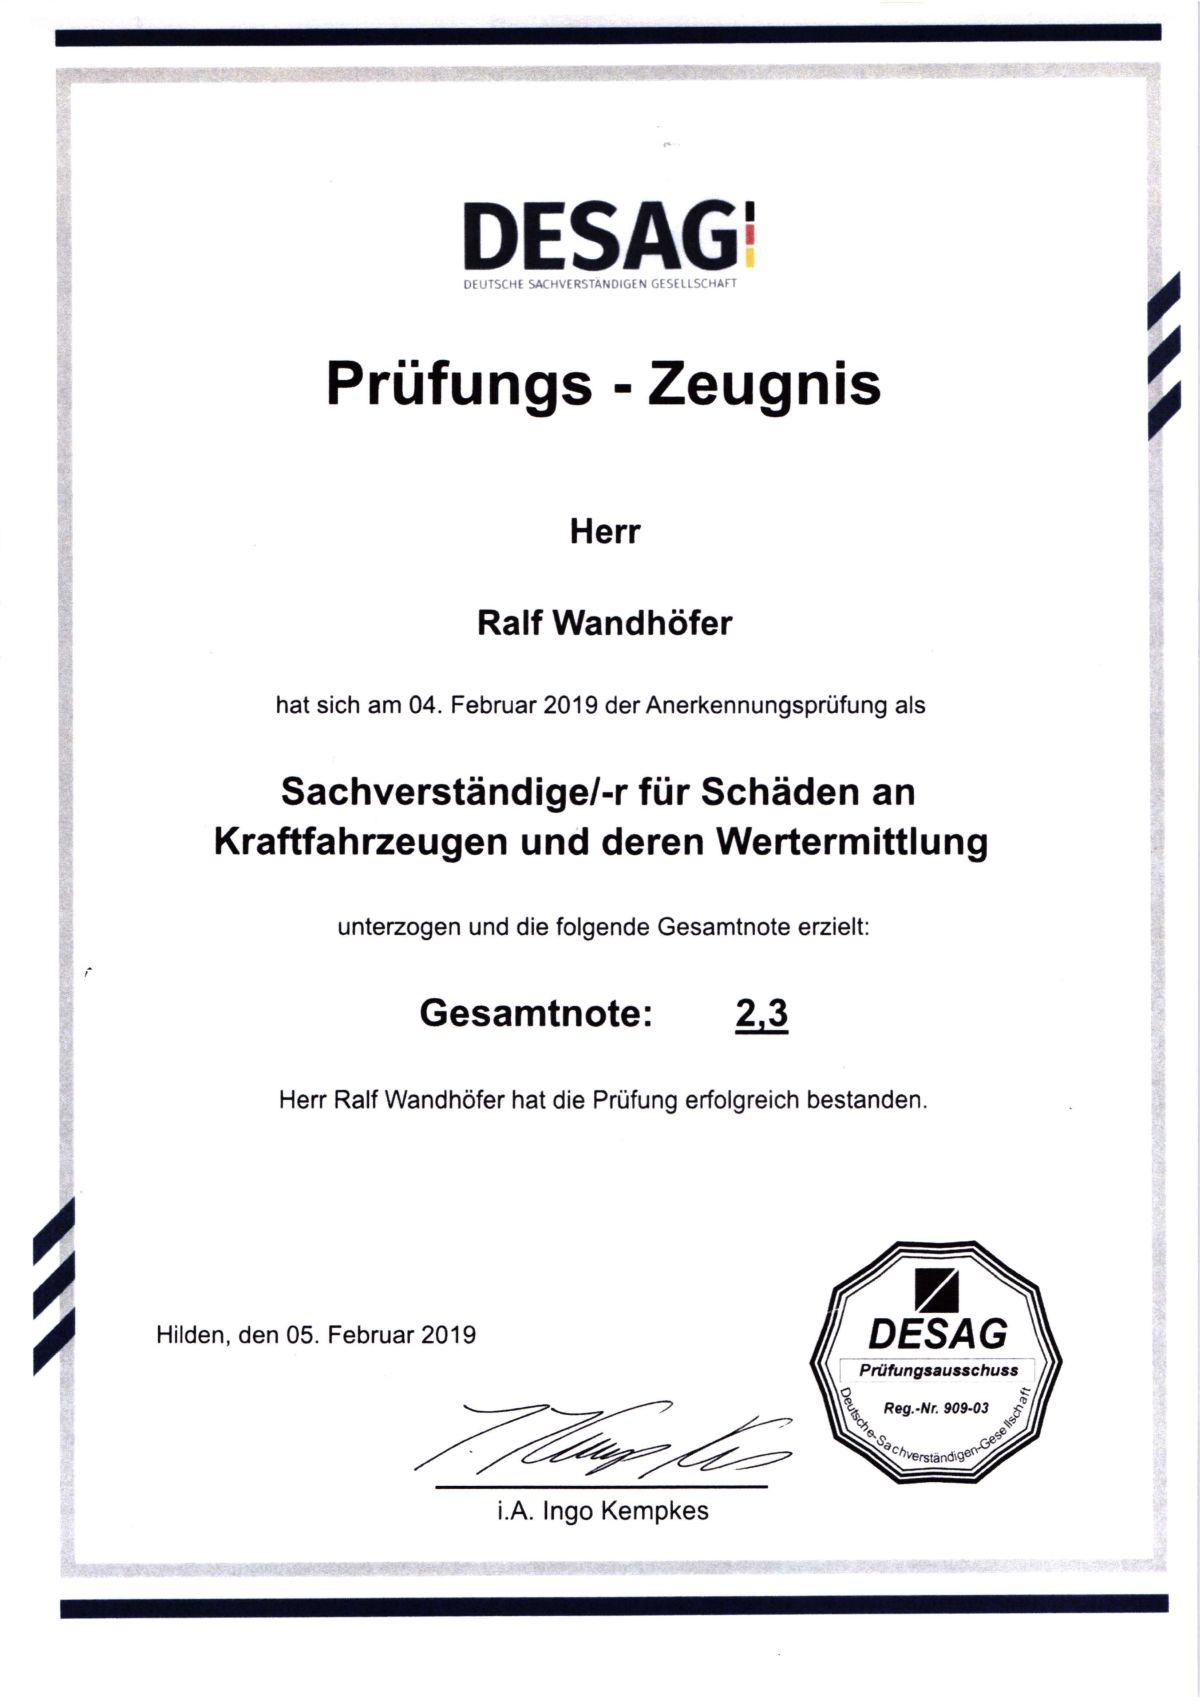 Ralf_Wandhöfer_Zertifikat_009